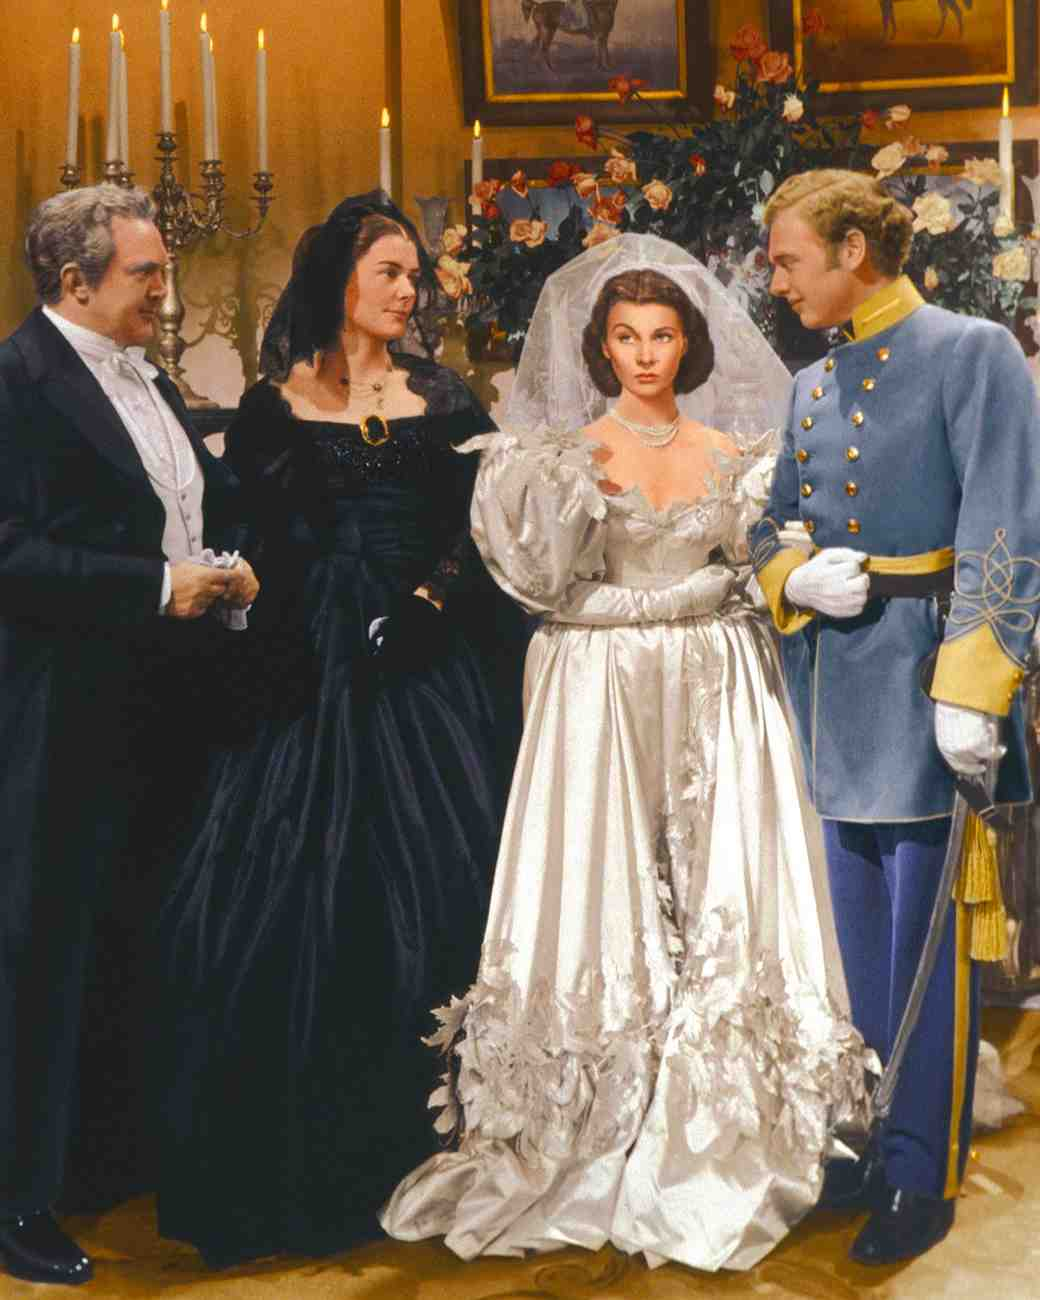 movie-wedding-dresses-gone-with-the-wind-vivien-leigh-0316.jpg